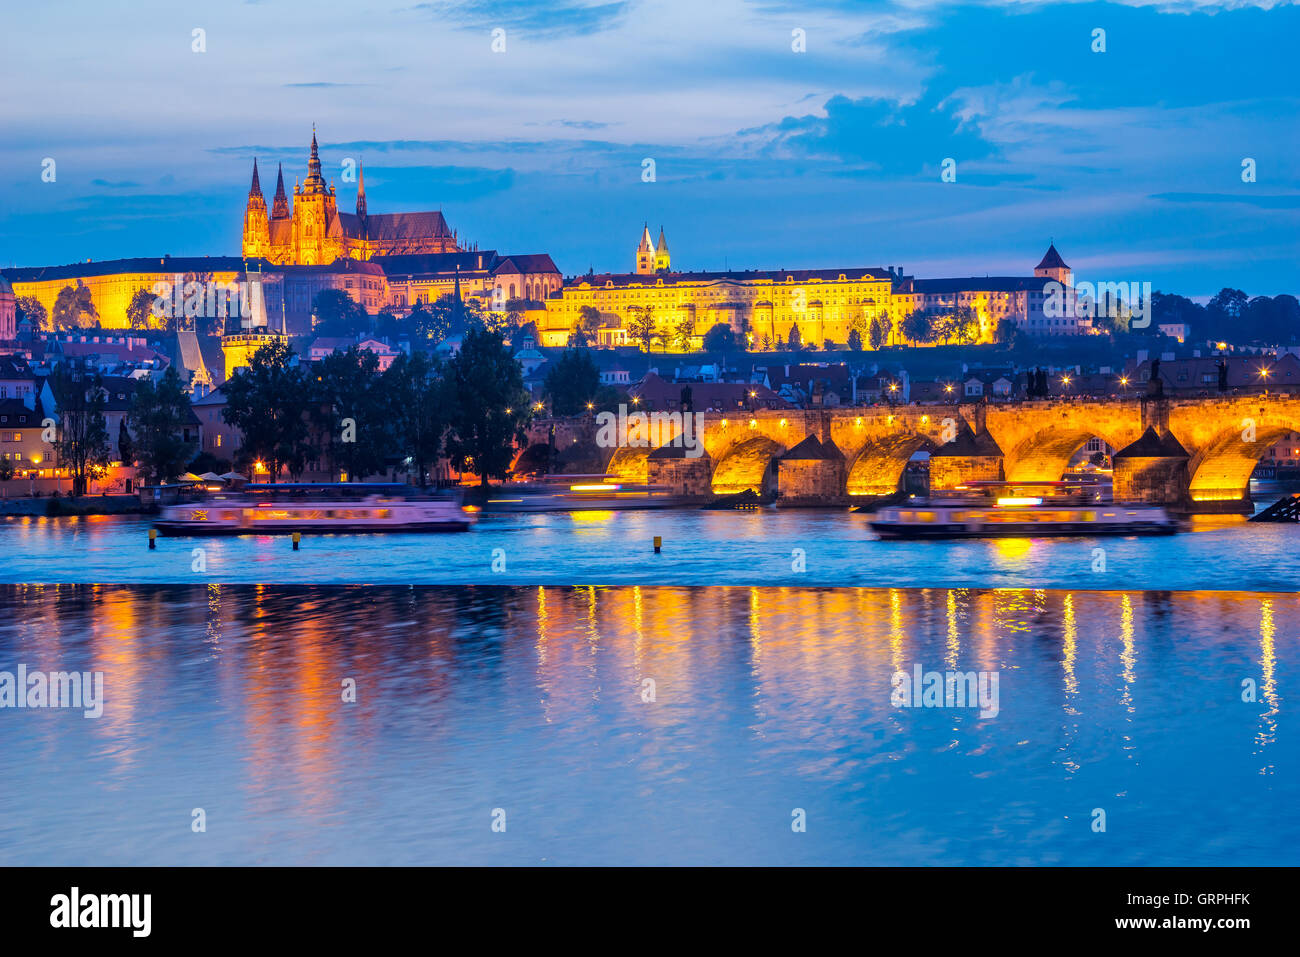 Views of the River Vltava, Charles Bridge and the Castle beyond. Prague Czech Republic Europe - Stock Image